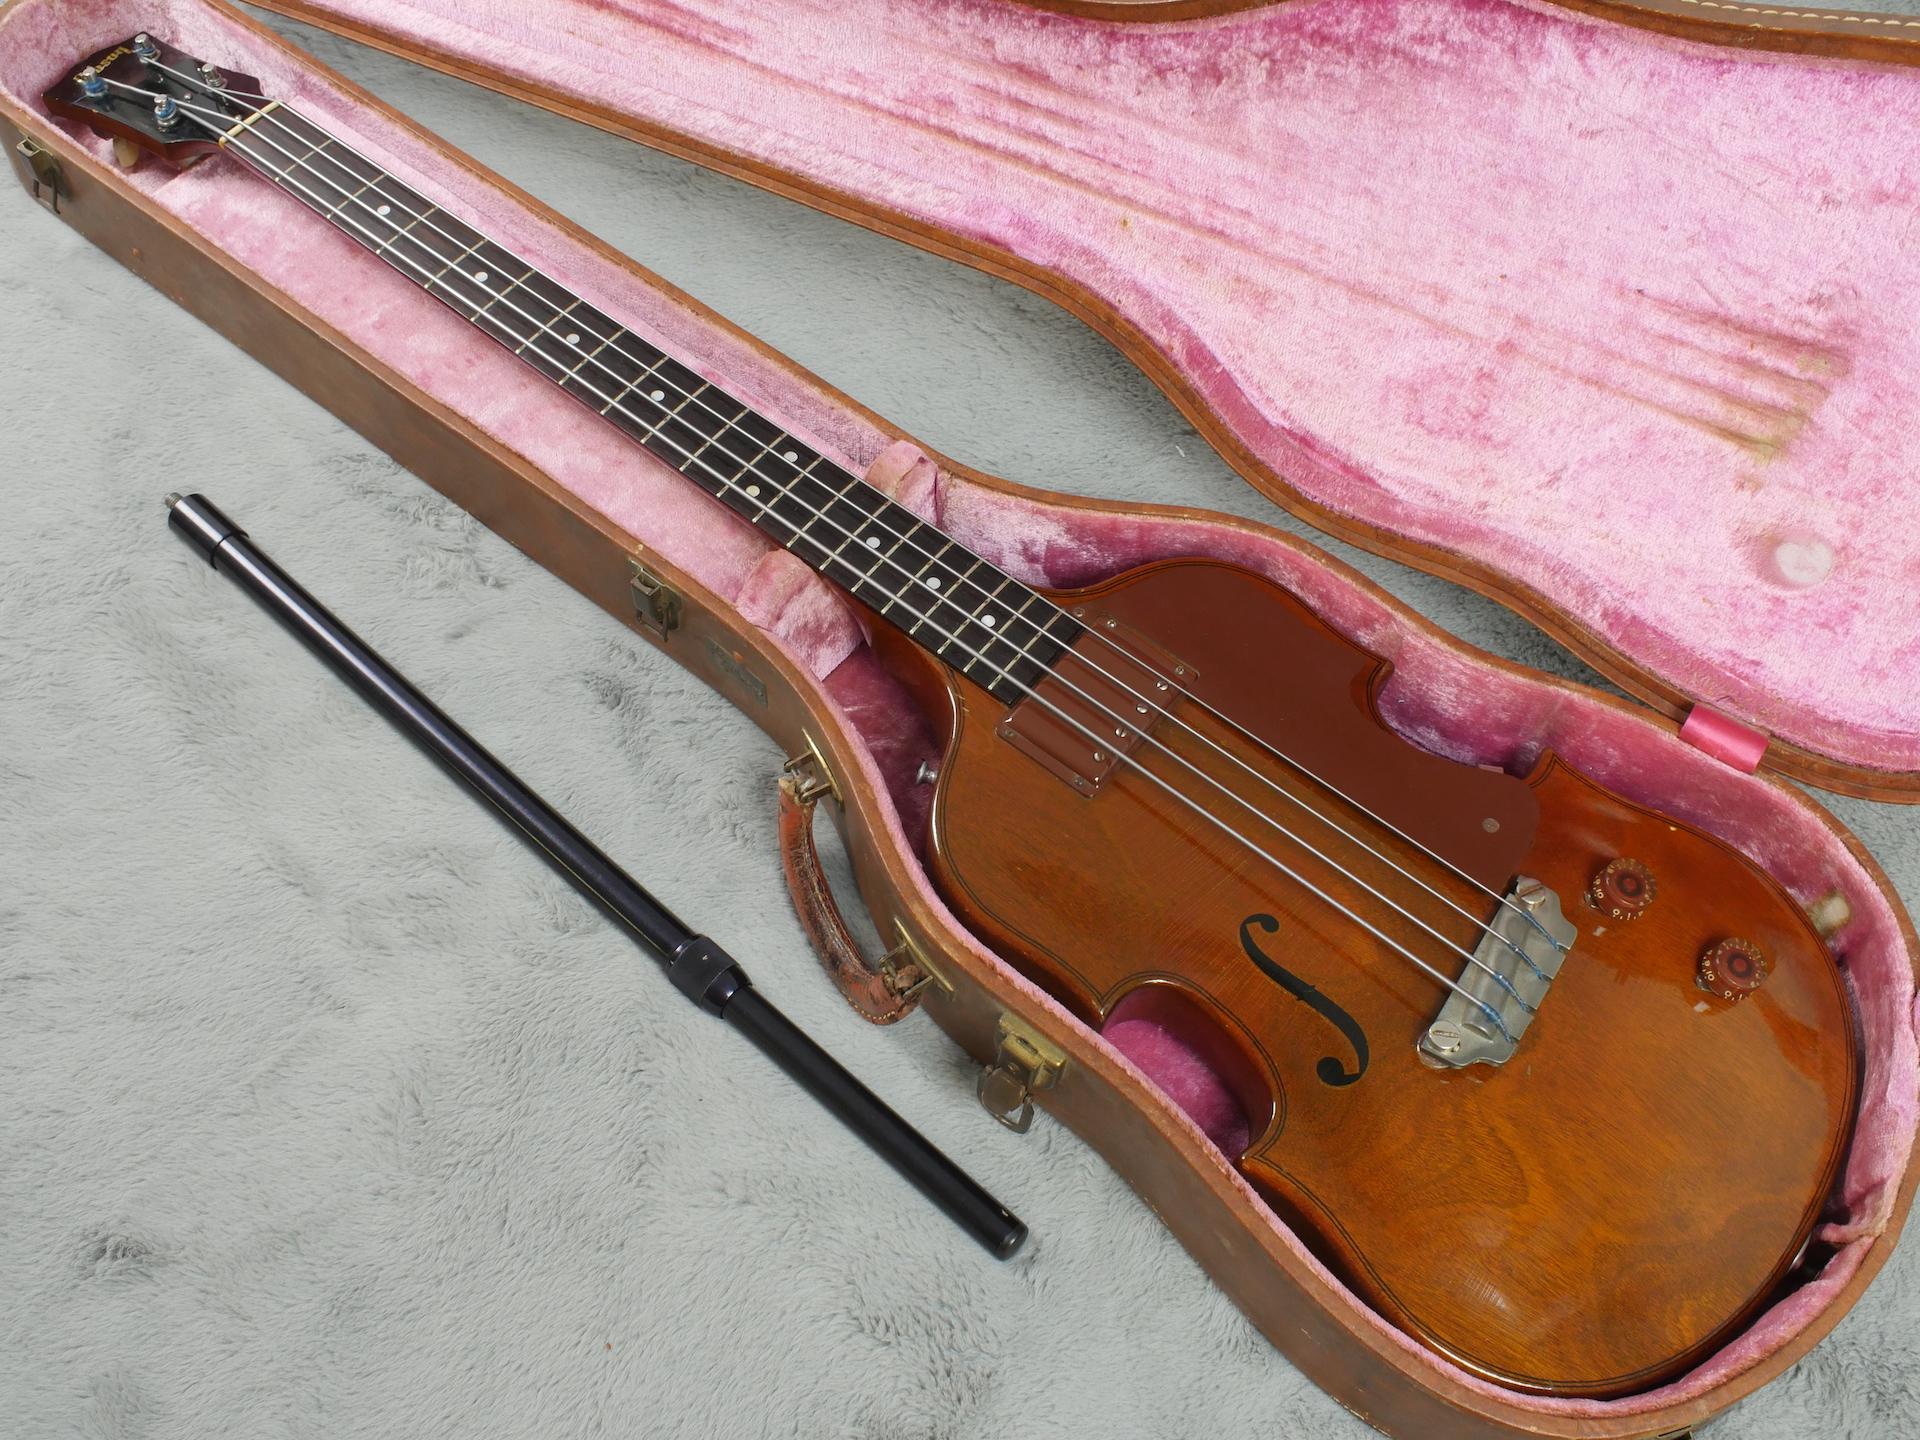 1953-gibson-eb-1-1.jpg